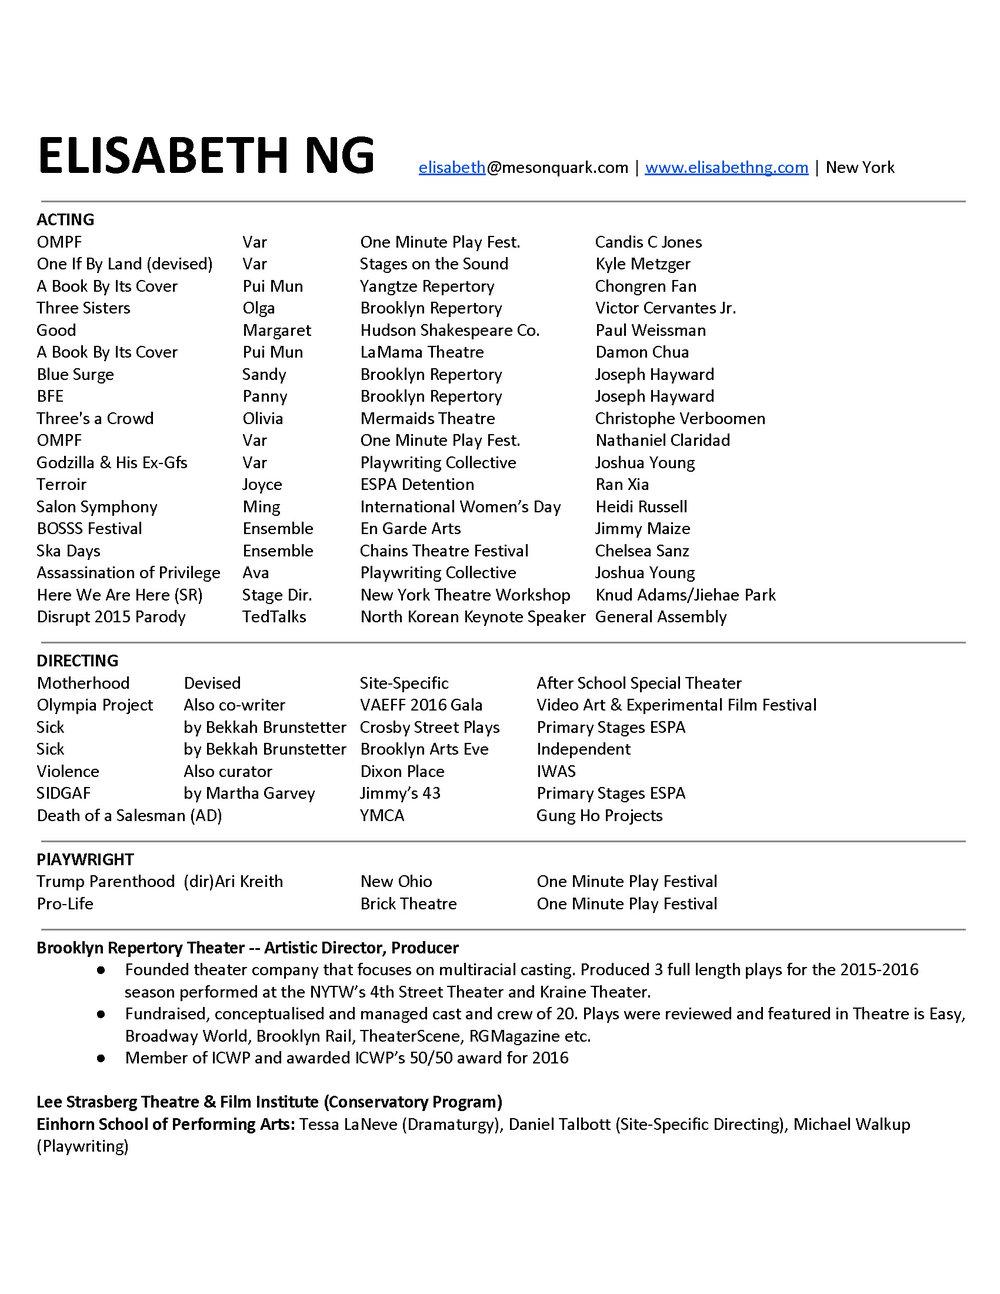 Elisabeth Theater Resume.jpg